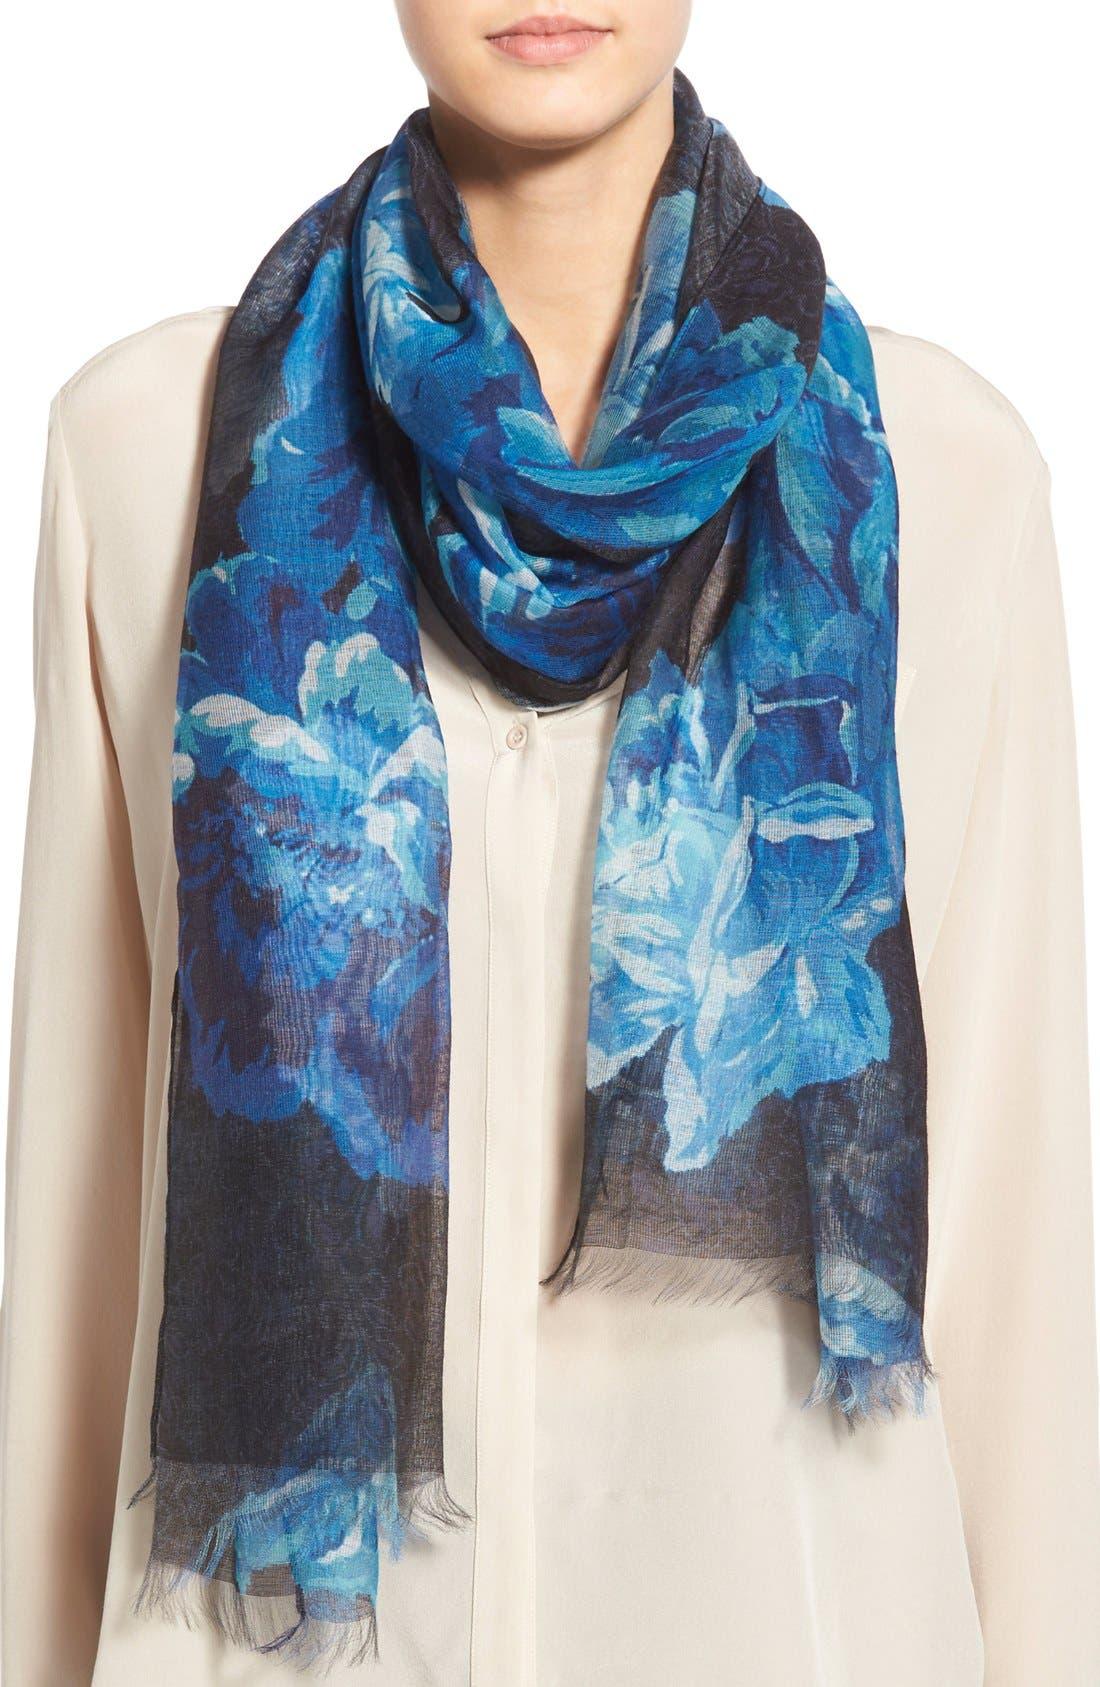 Alternate Image 1 Selected - Badgley Mischka 'Sheer Rose' Floral Print Modal & Silk Scarf